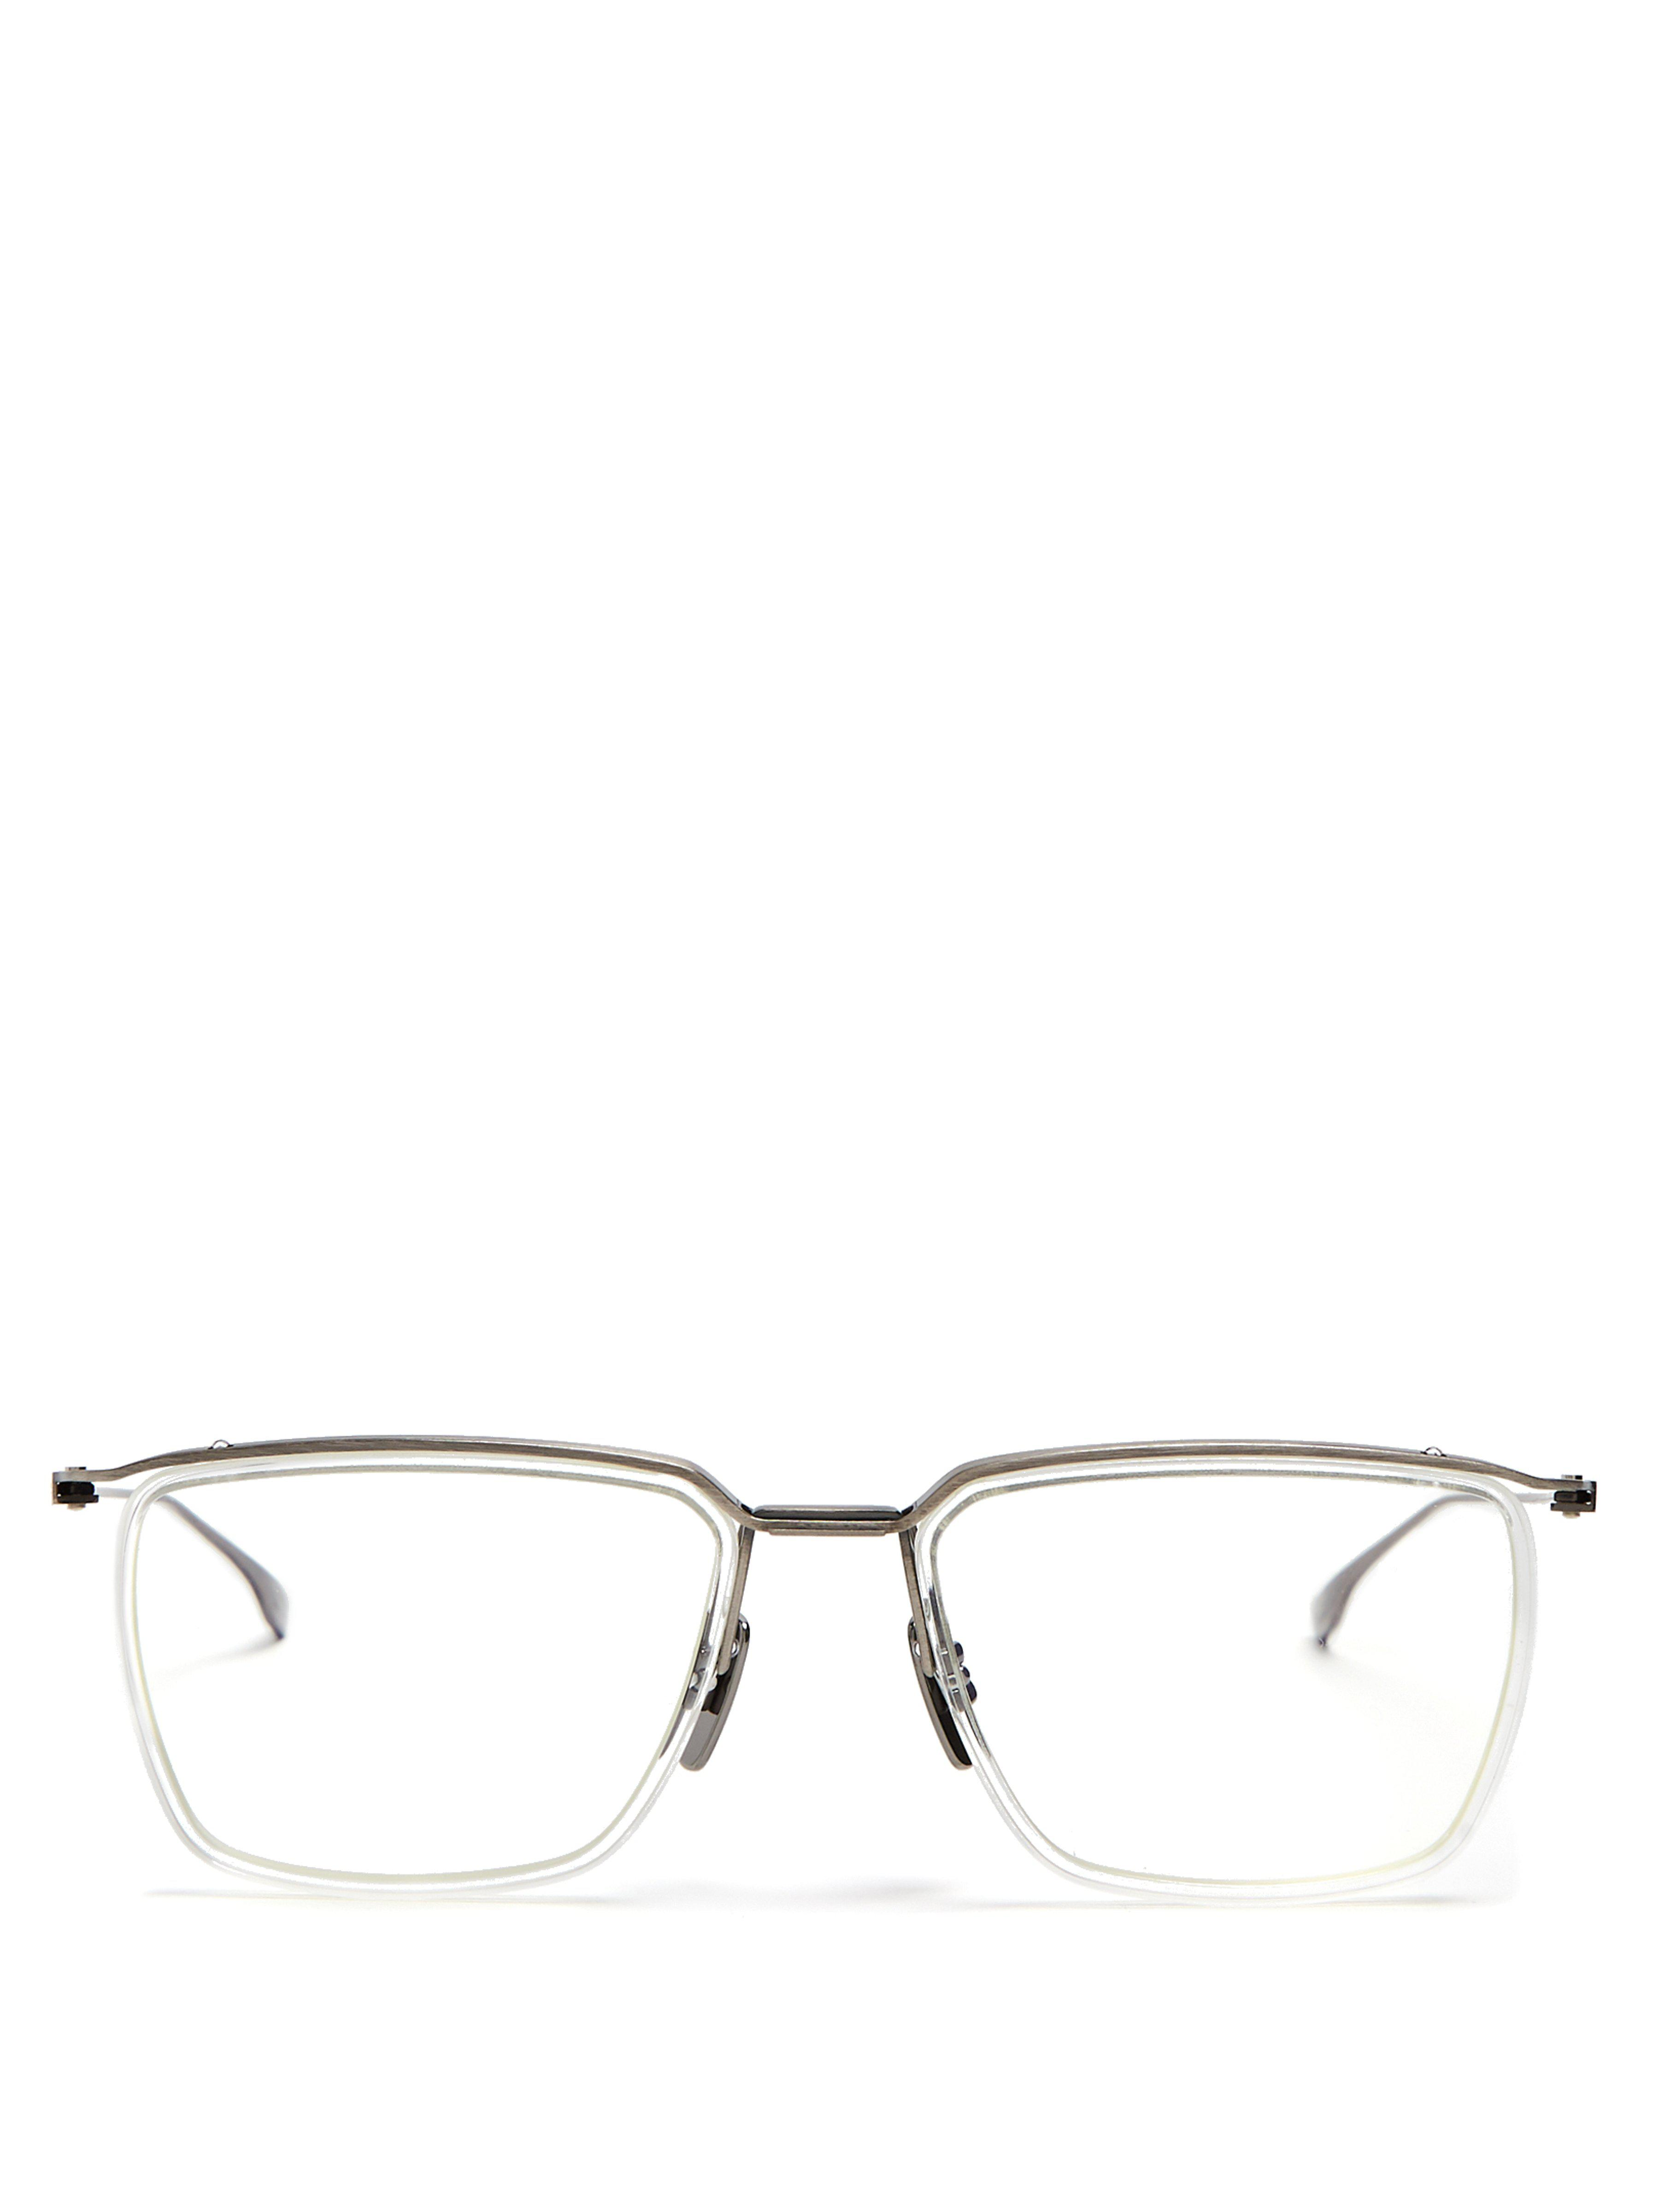 9ede269ec96 Dita Eyewear Schema Square Frame Glasses in Metallic for Men - Lyst